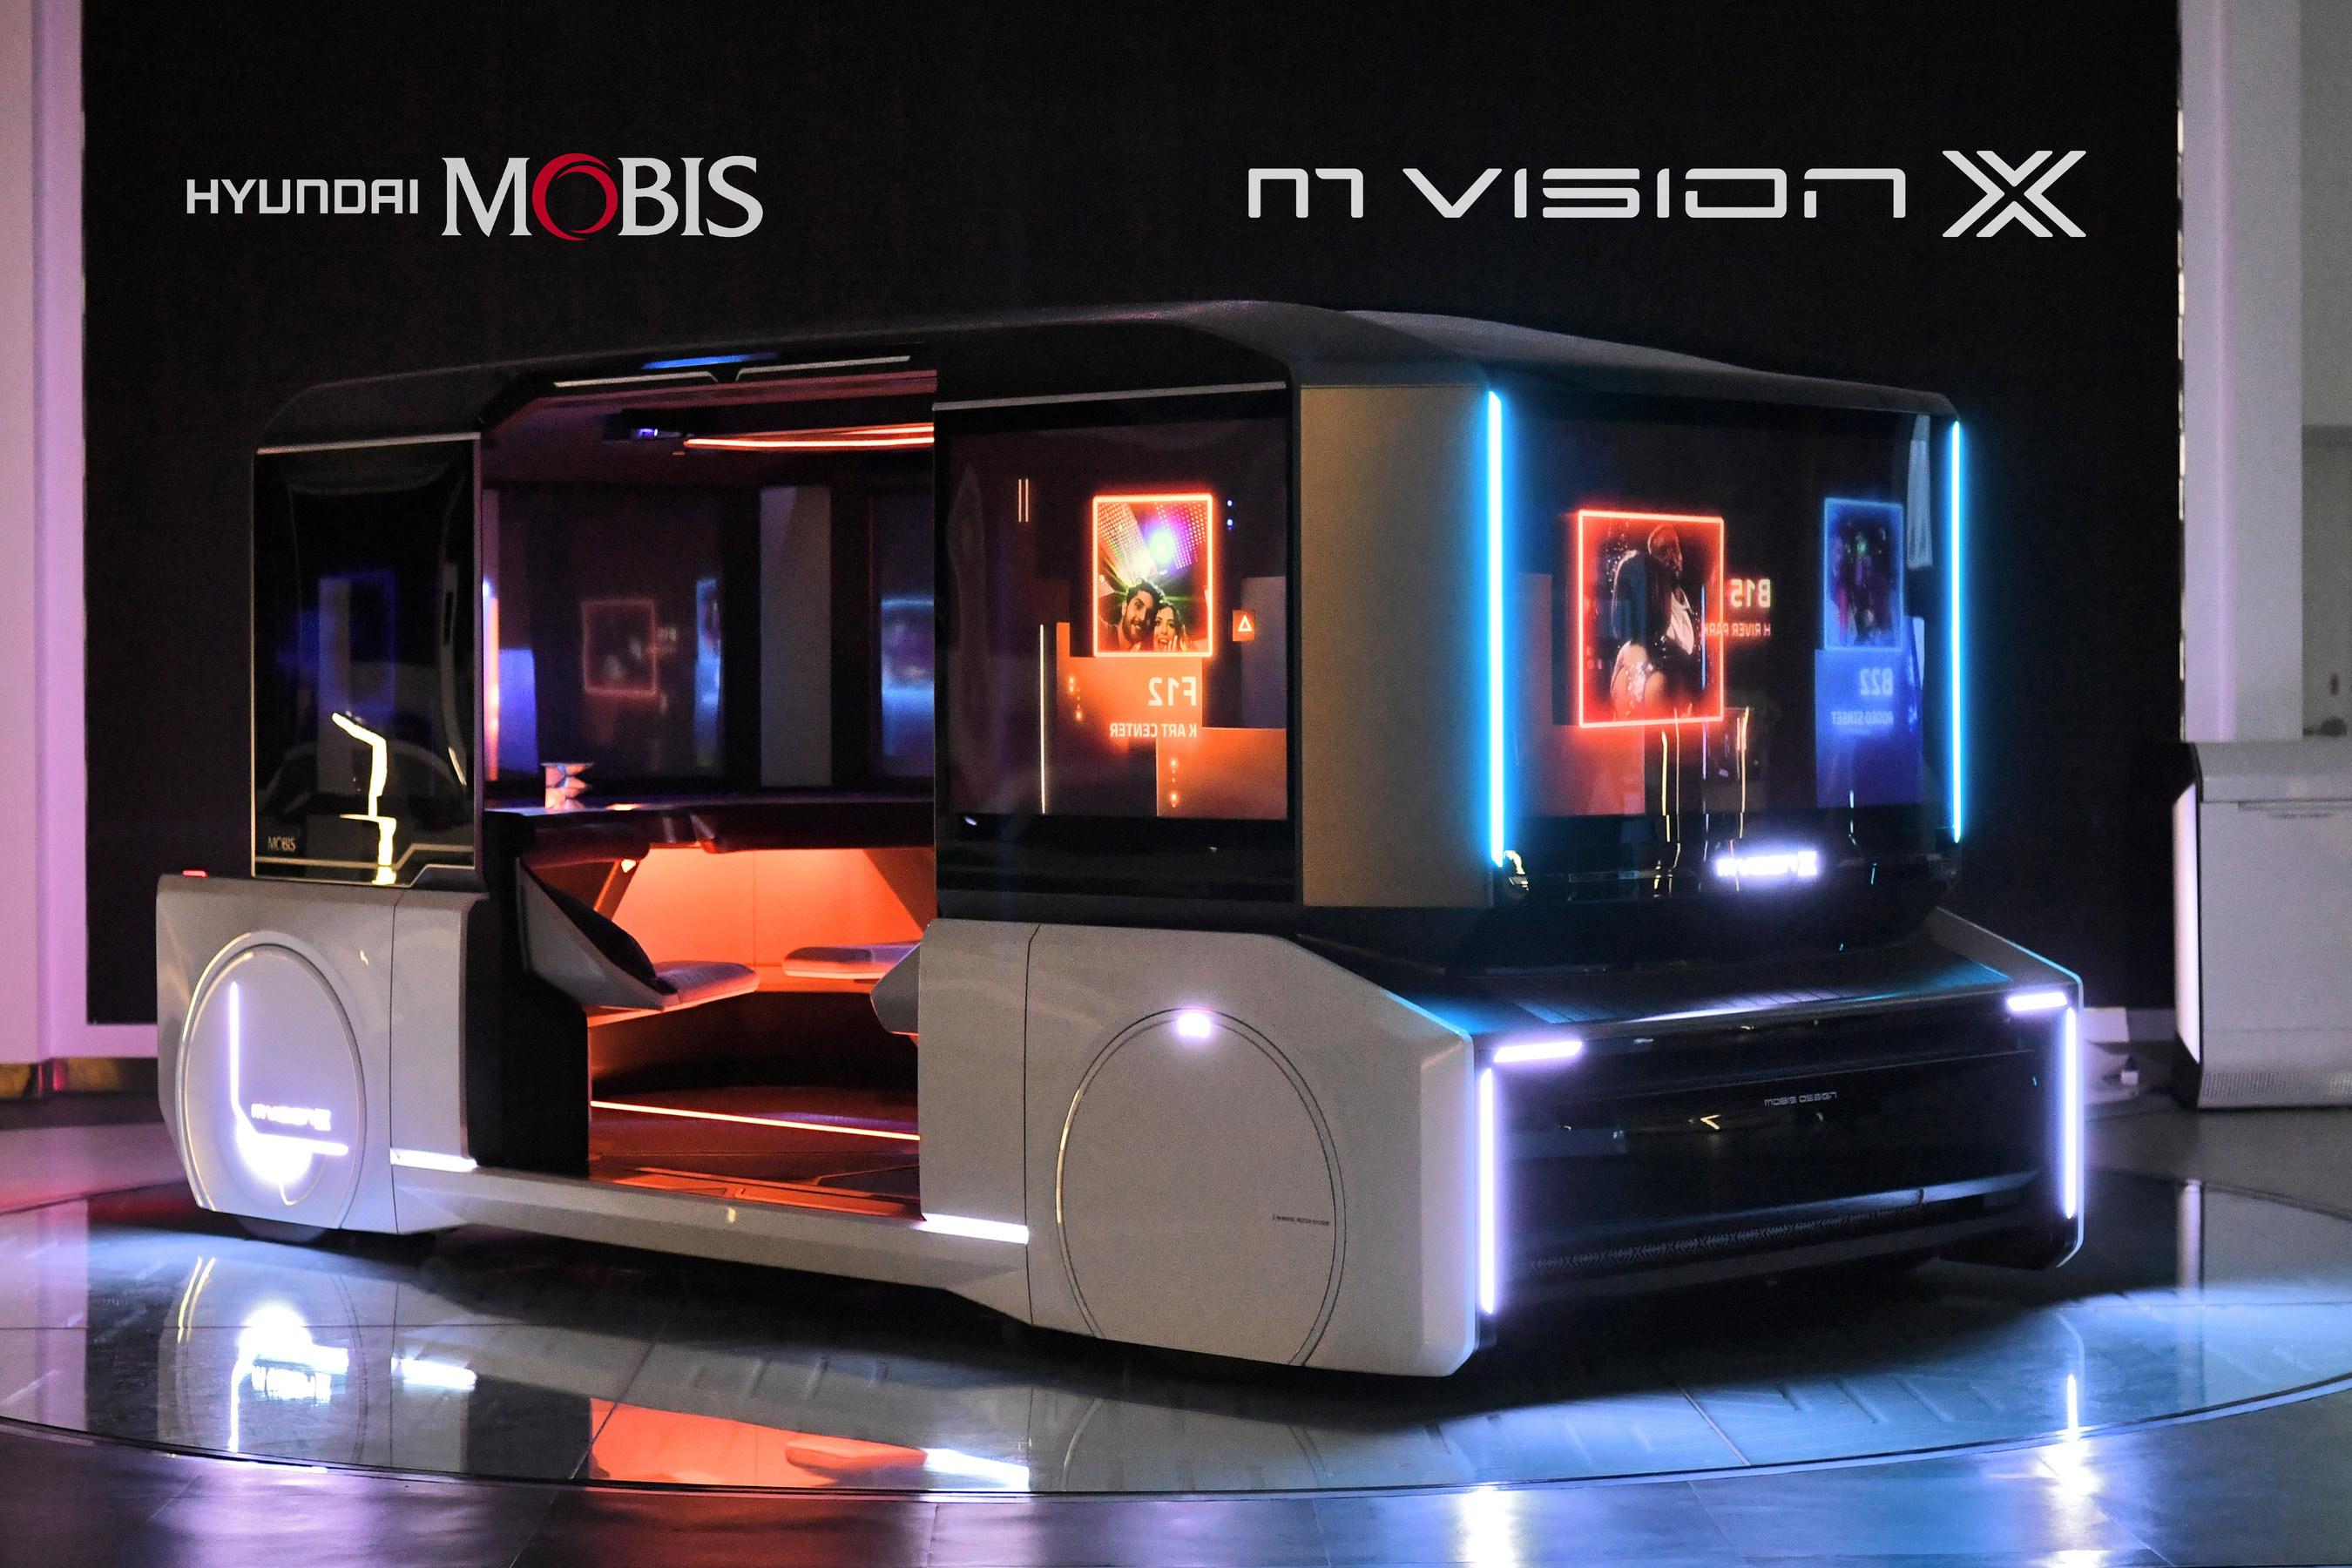 Hyundai Mobis unveils a new mobility concept � m.vision X and m.vision POP